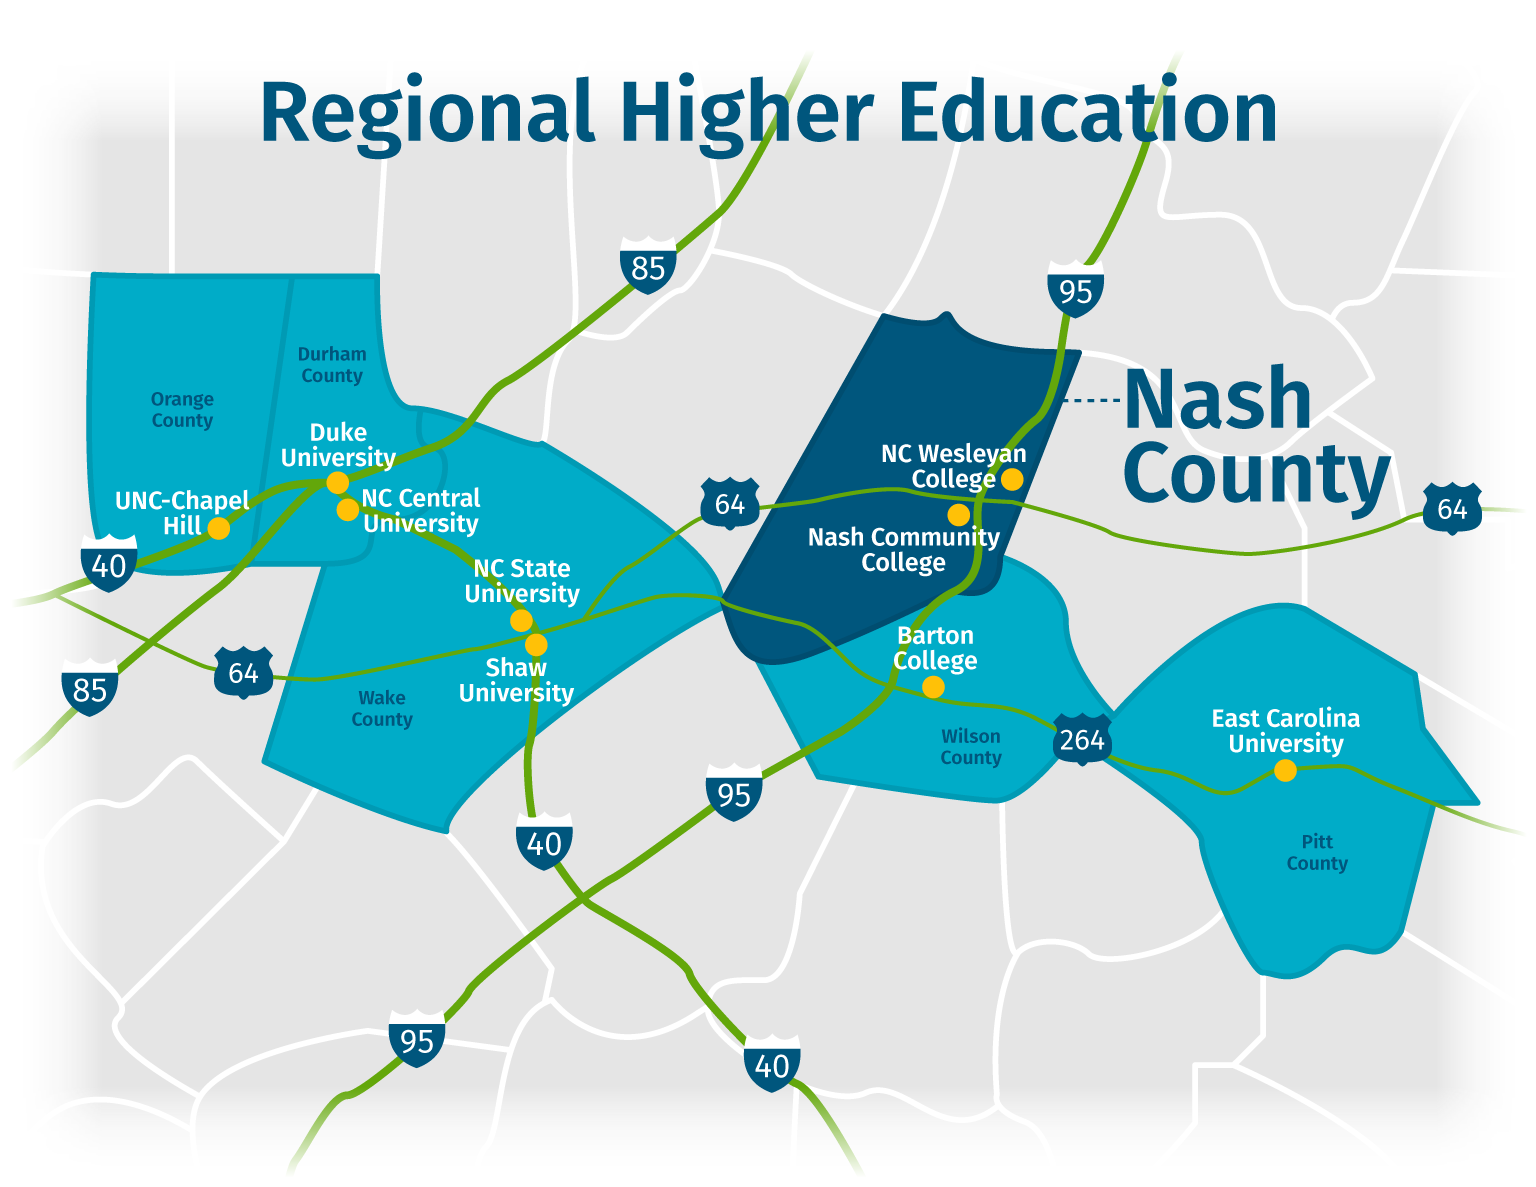 Nash County Regional Education Map